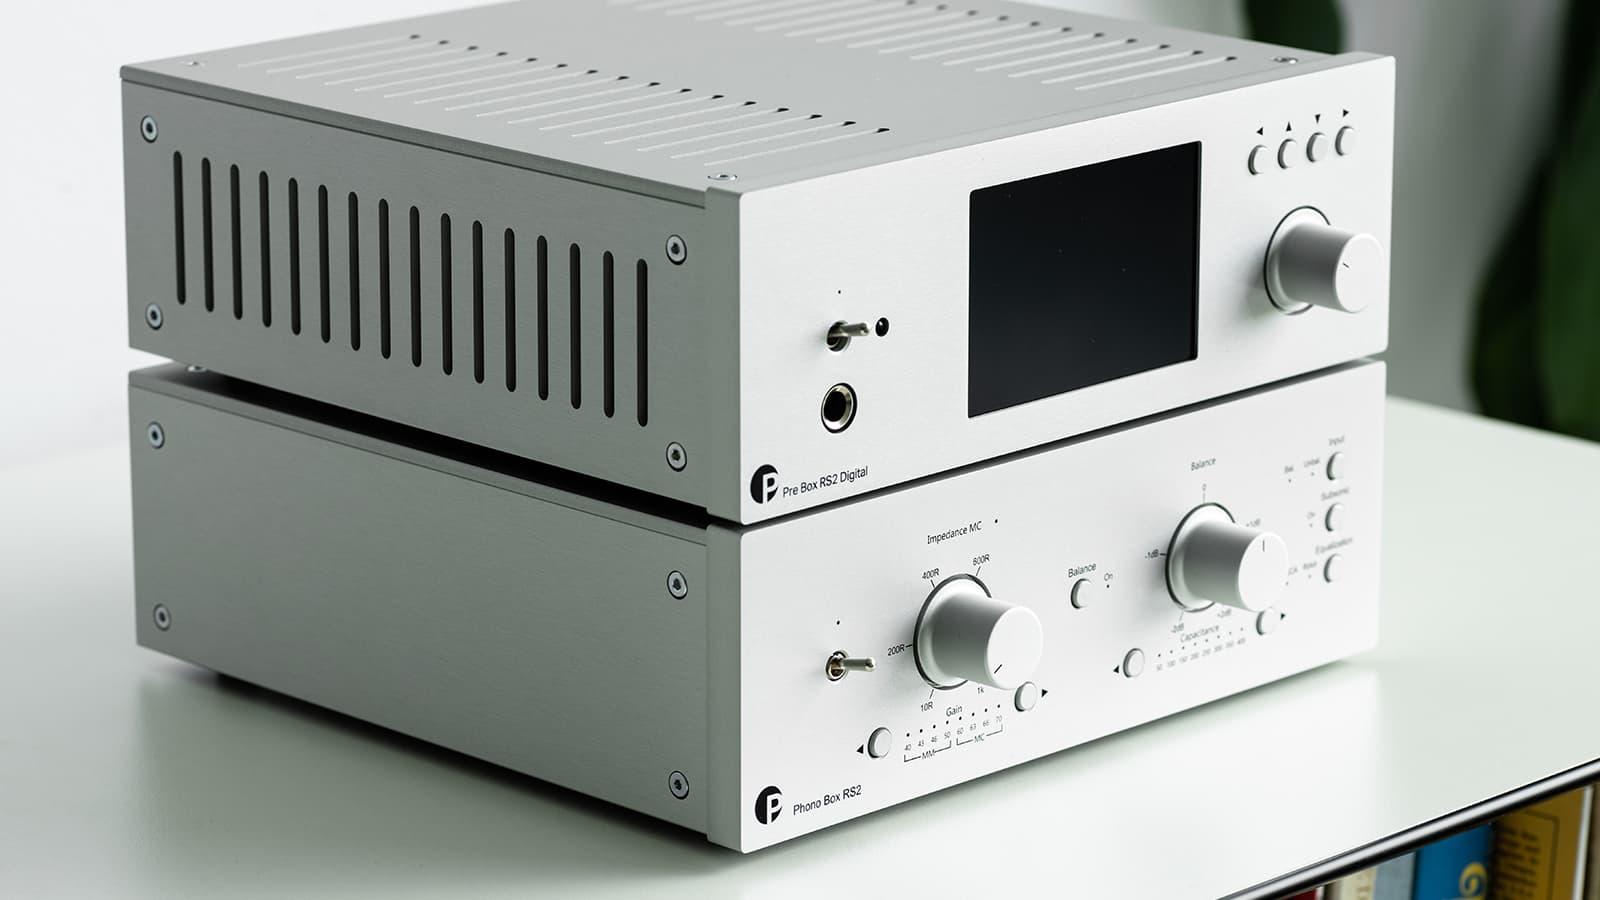 Pro-Ject Phono Box RS2 below Pre Box RS2 Digital